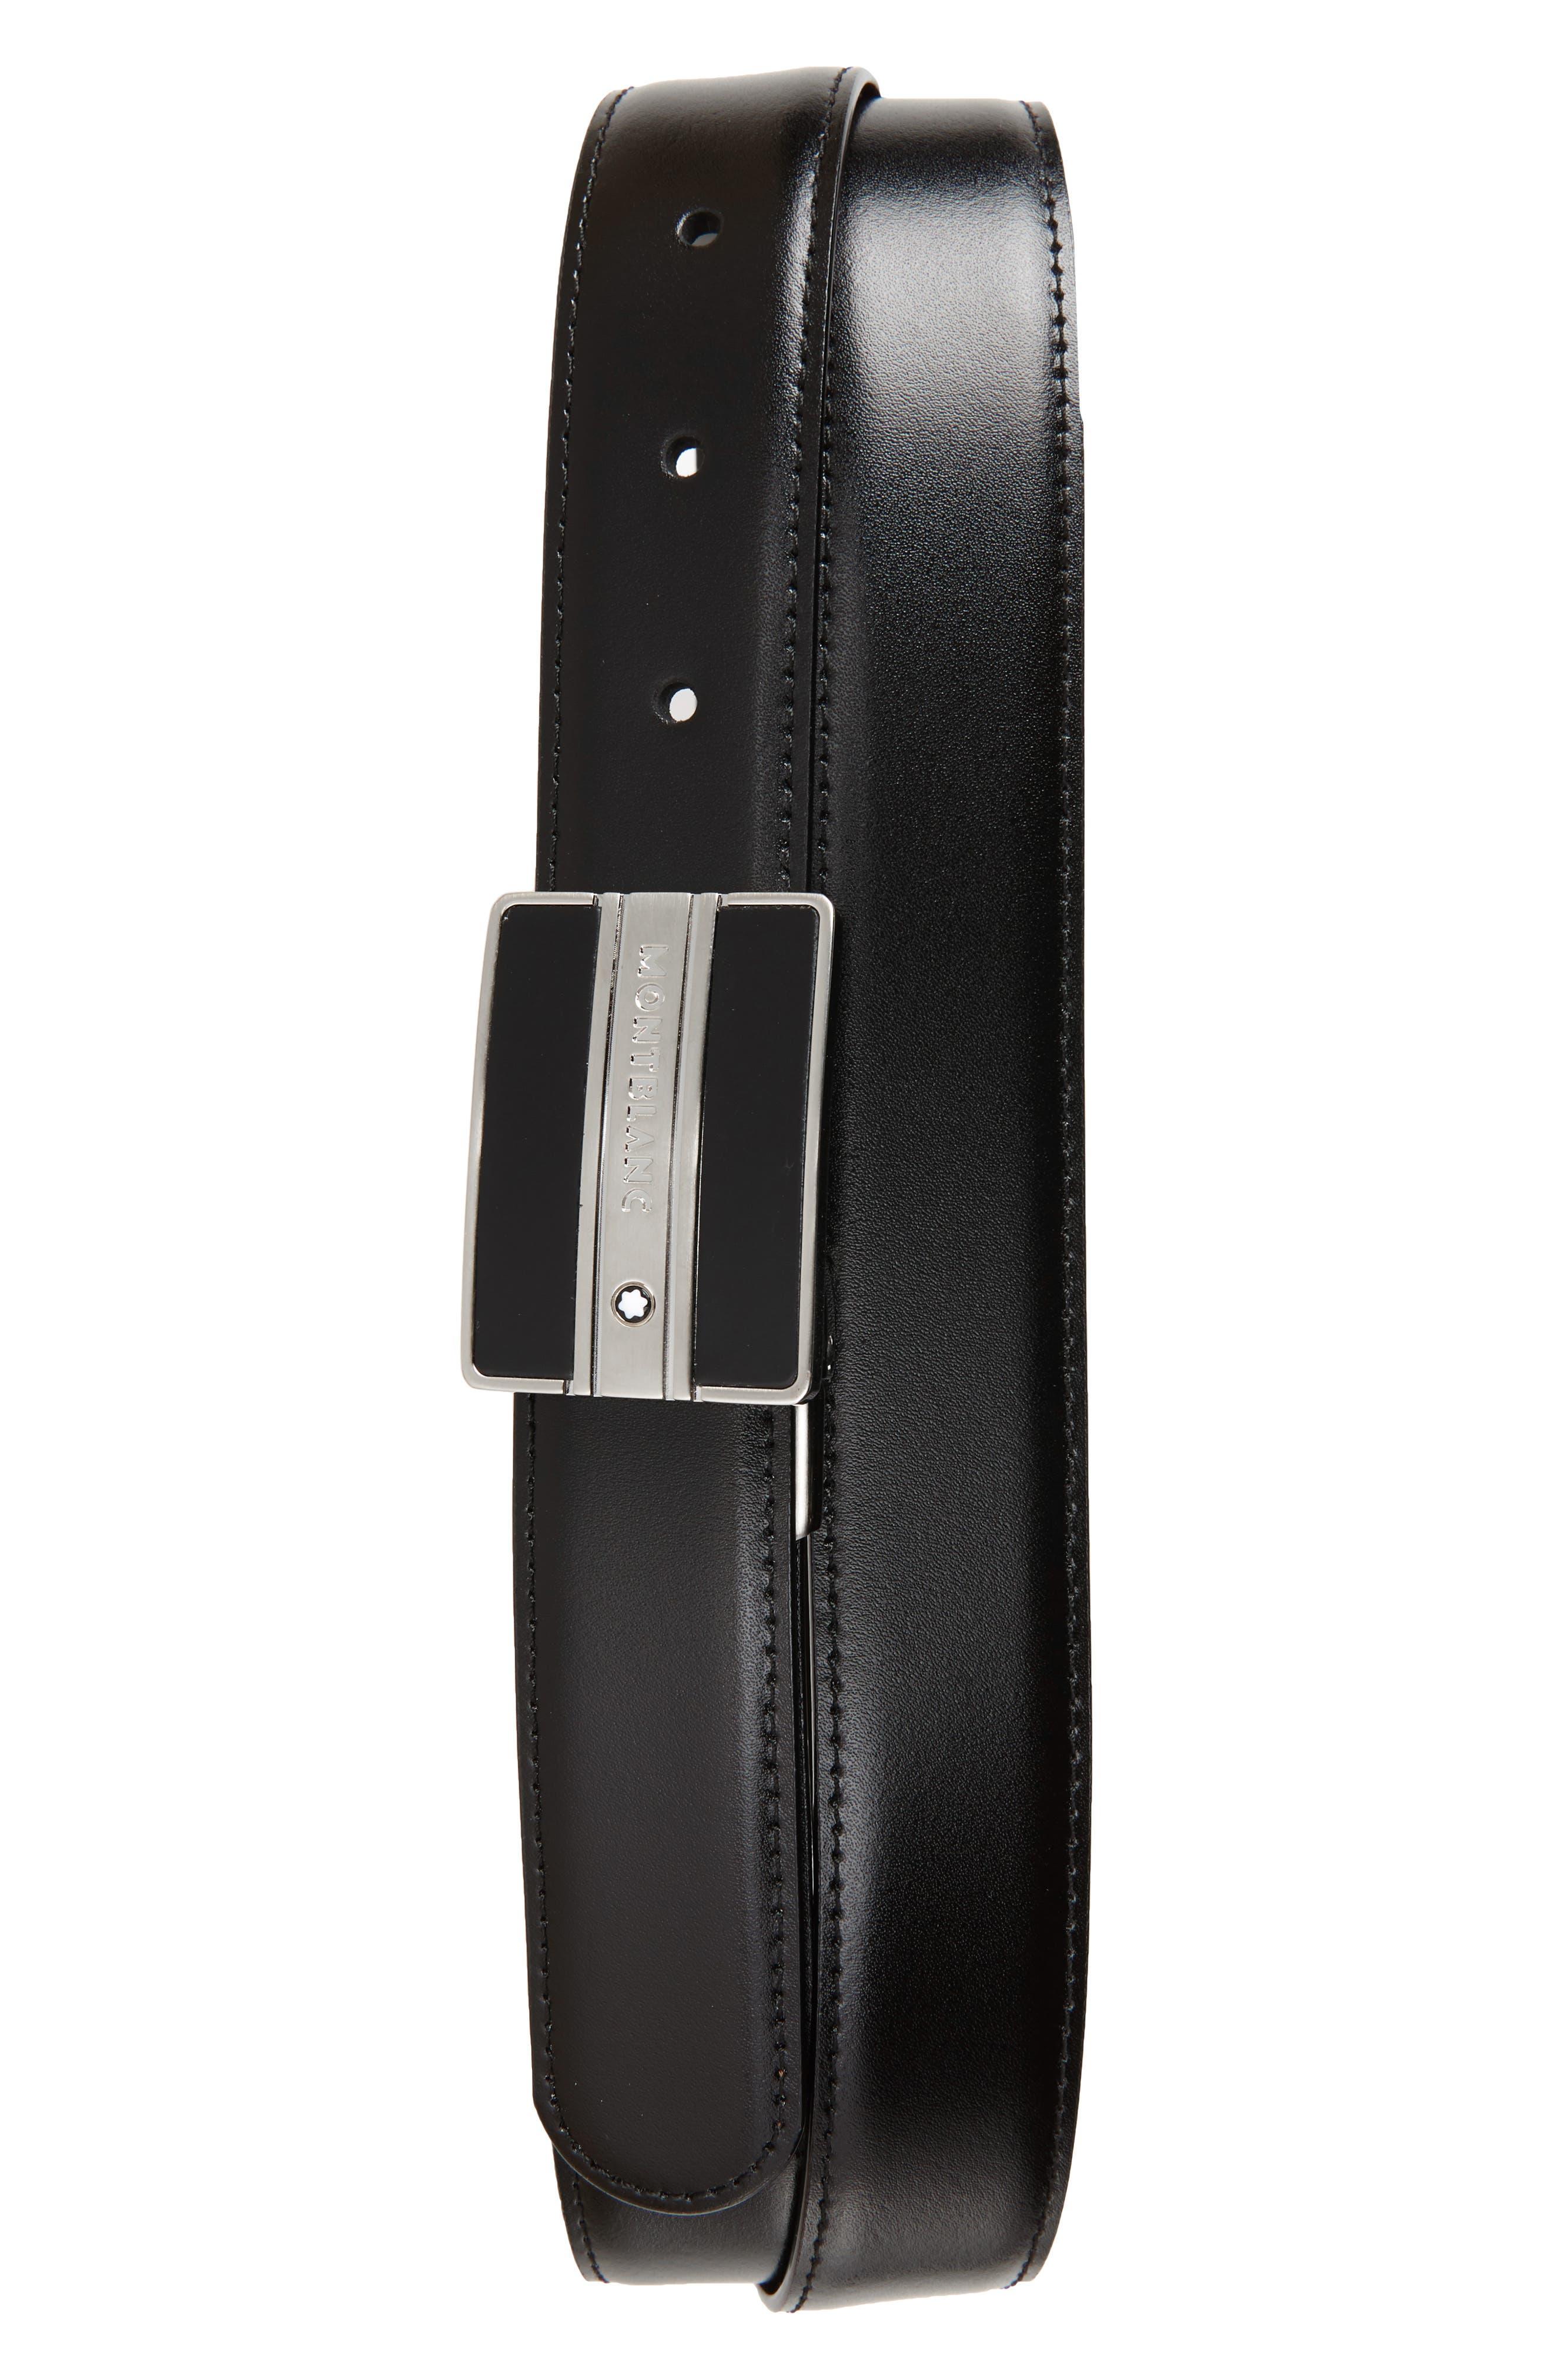 MONTBLANC Meisterstück Buckle Reversible Leather Belt, Main, color, BLACK/ BROWN